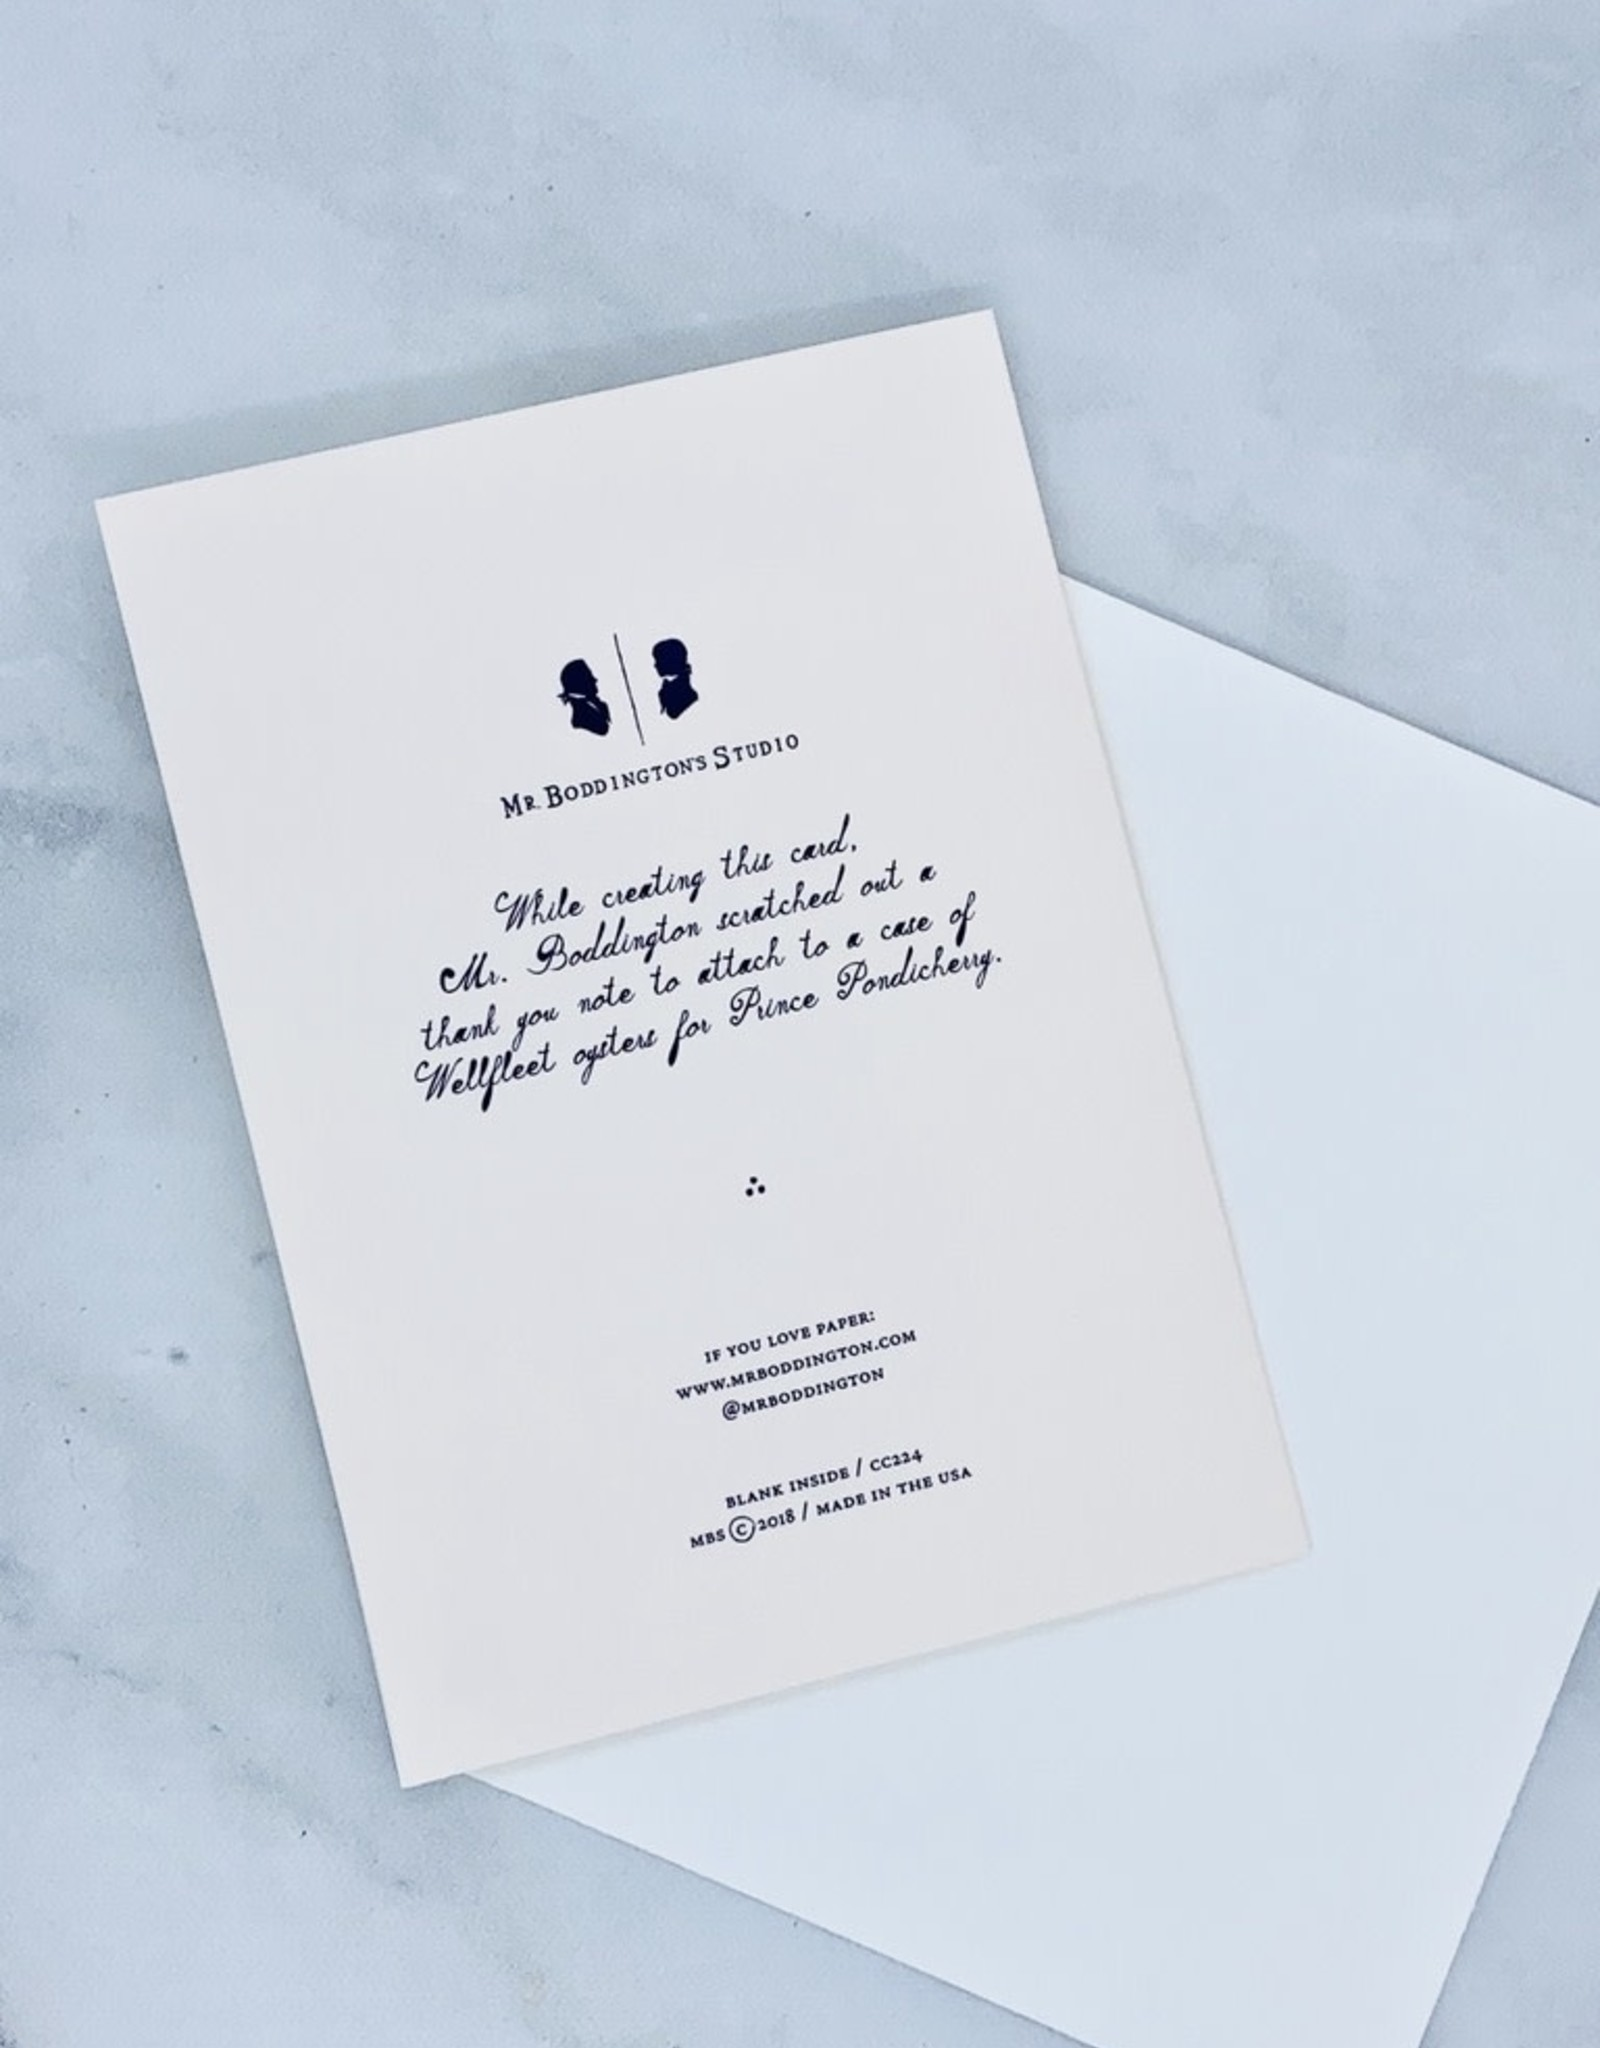 Mr. Boddington's Studio Boatloads Thank You Card